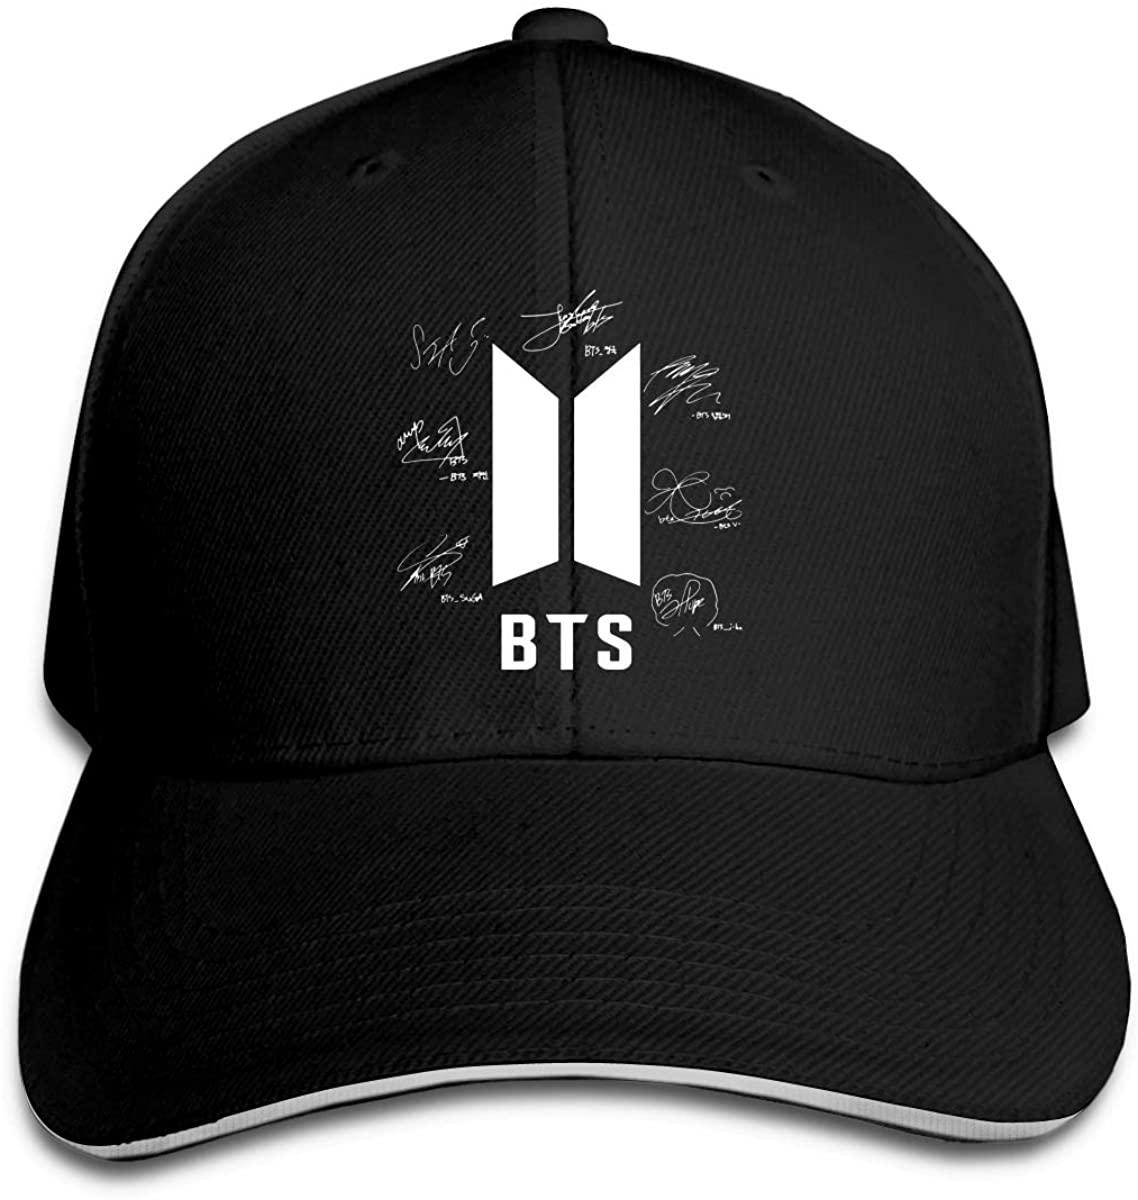 Frftgxcdf BTS-Bangtan Boys Autograph Unisex Adjustable Hat Black